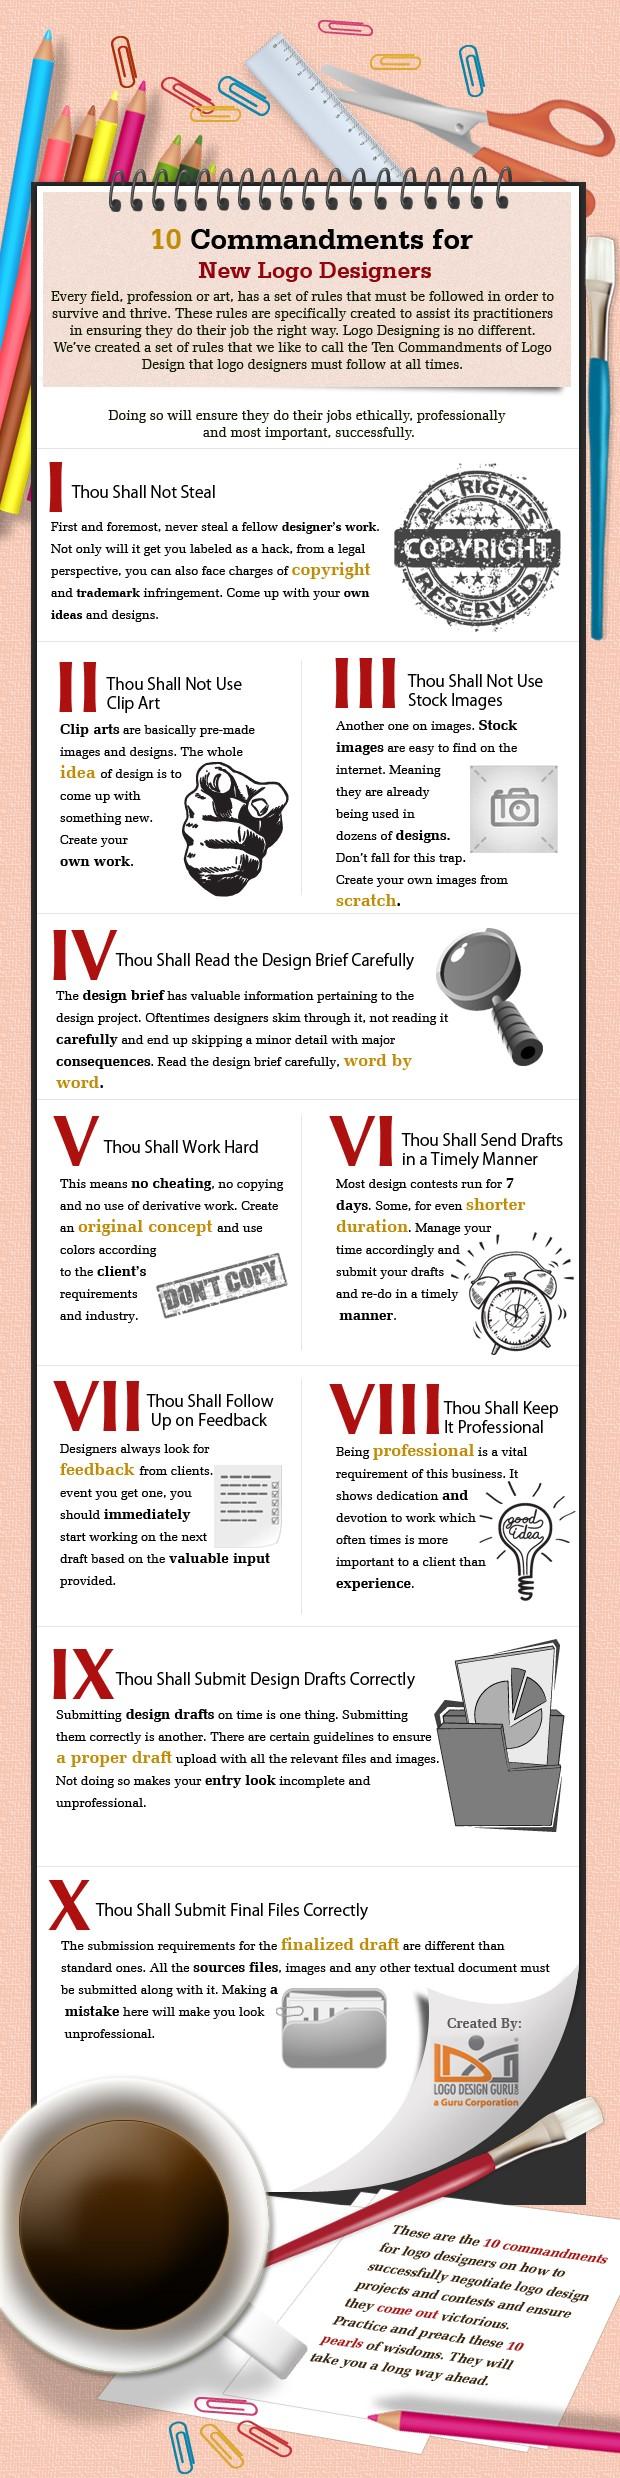 10 Commandments for New Logo Designers